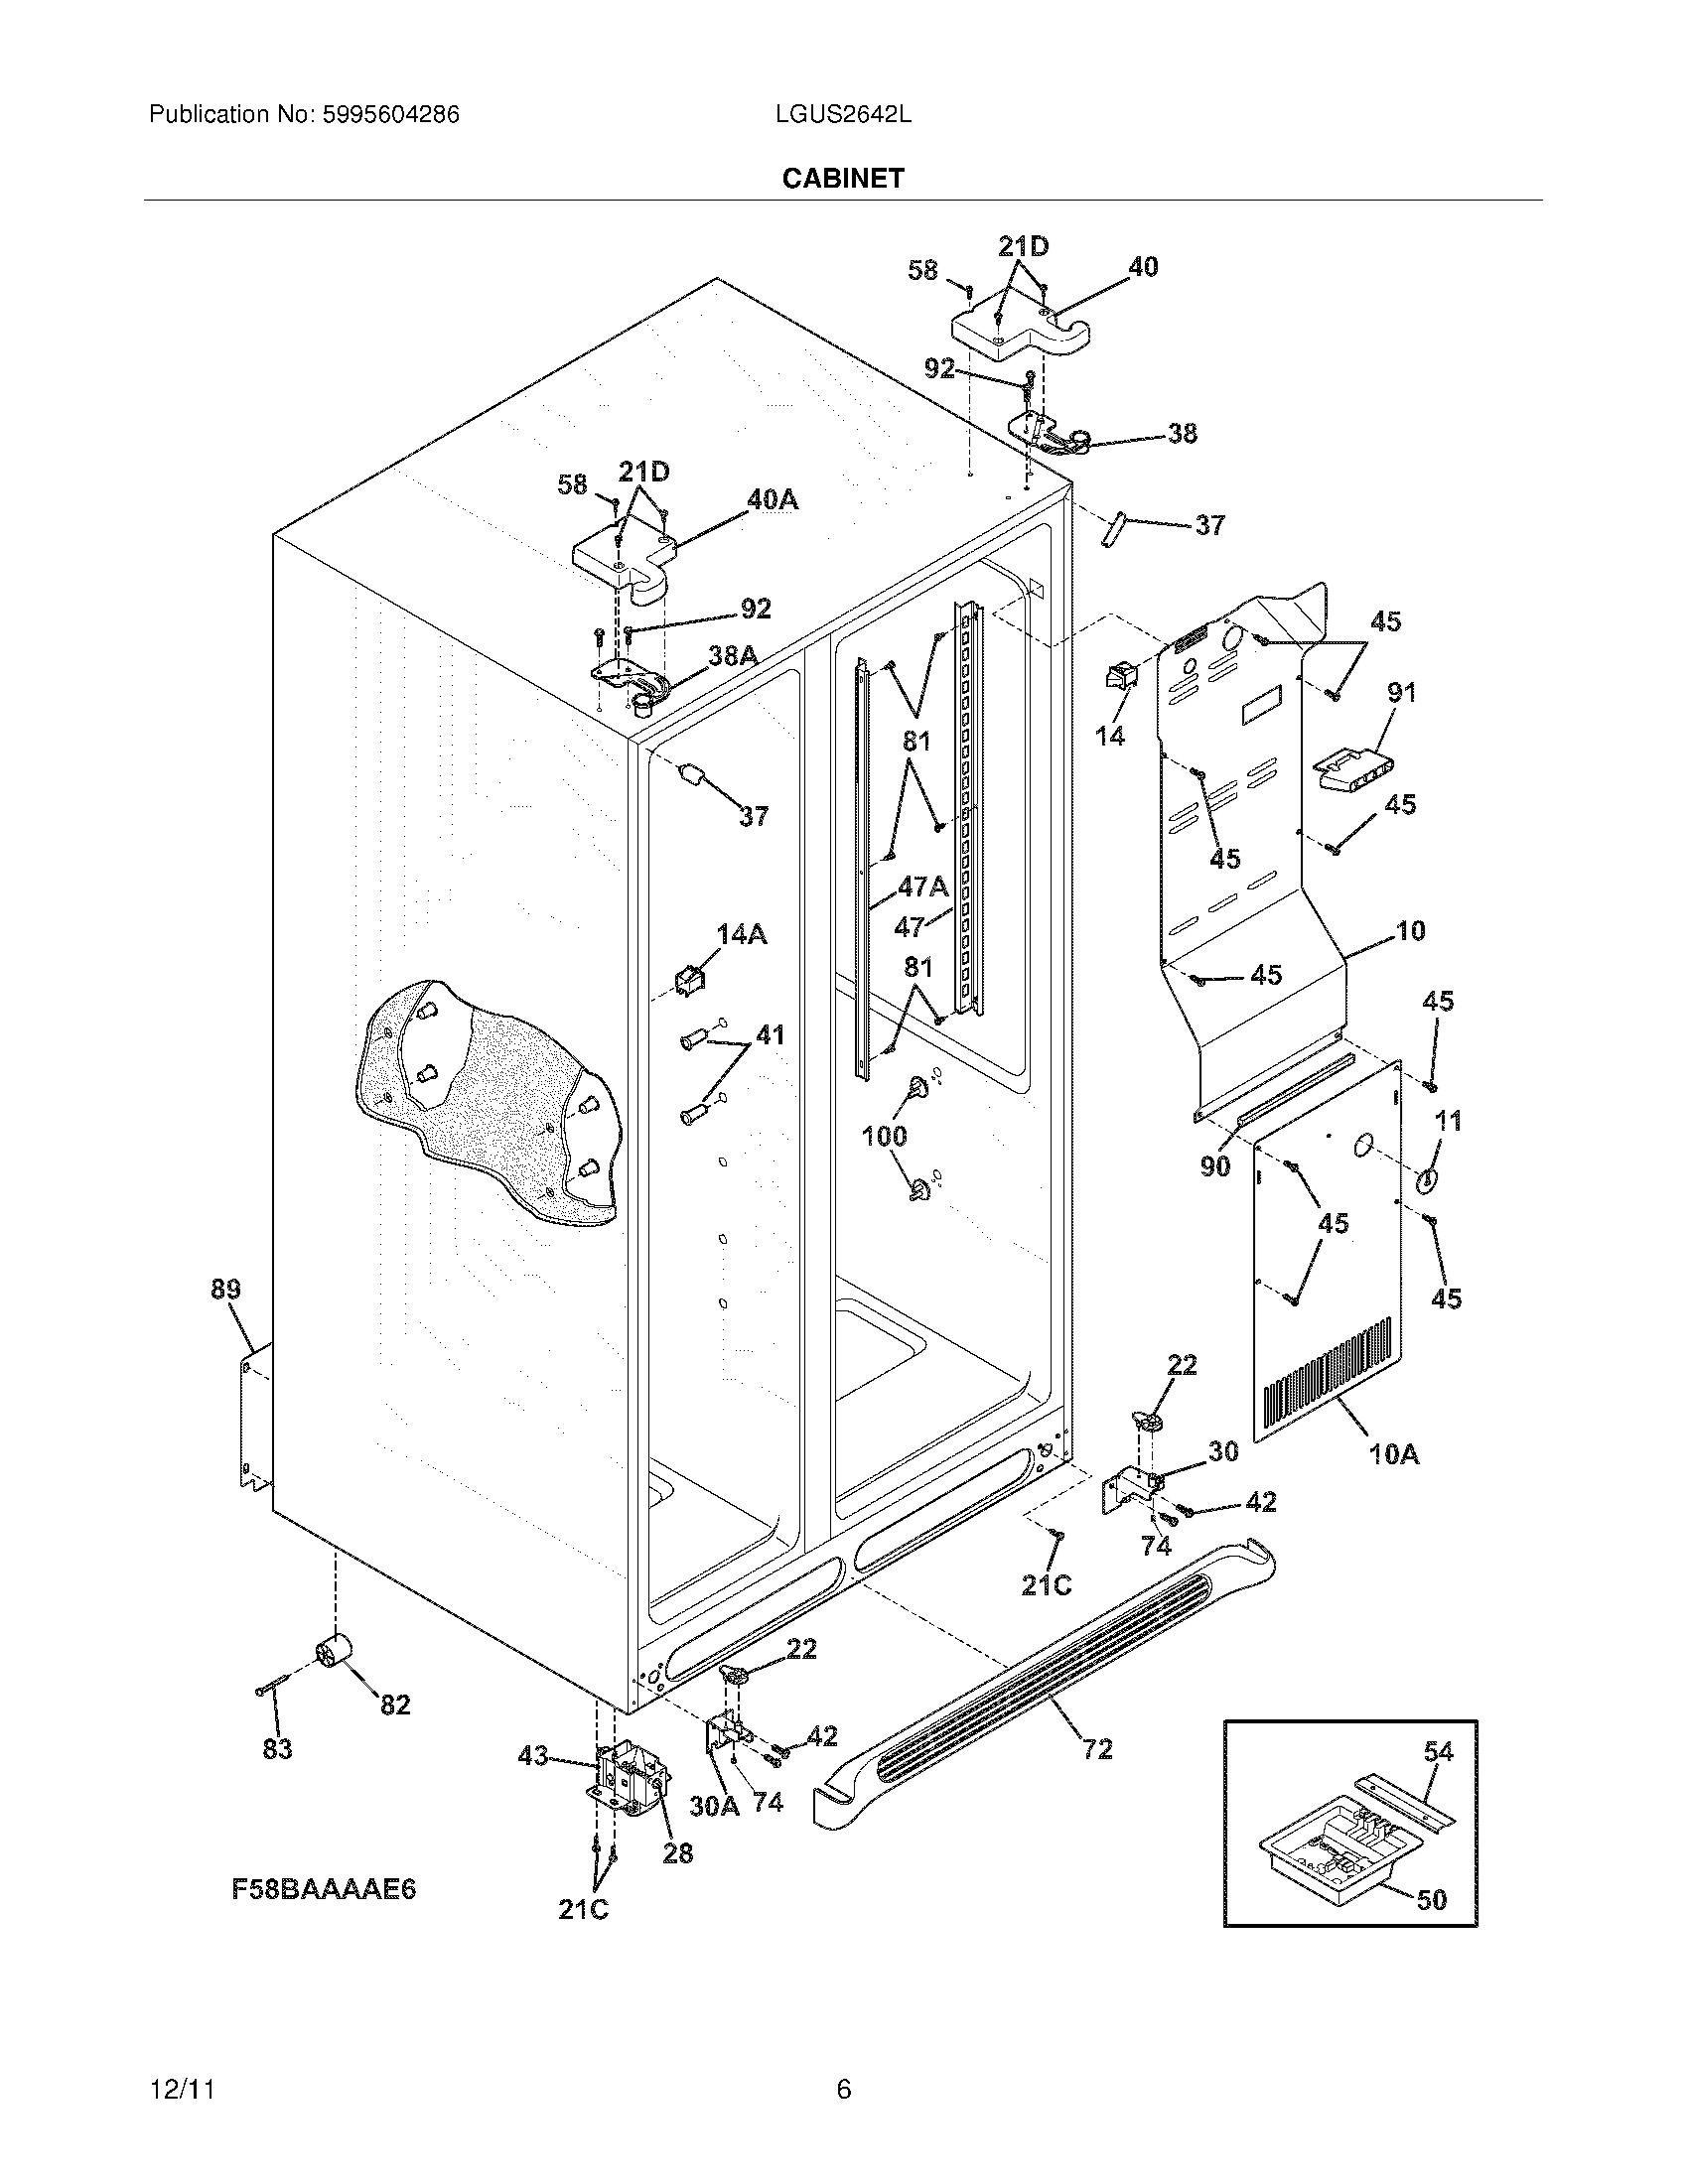 ElectroluxImg_19000101 20150717_00134901 ge refrigerator wiring diagram dolgular com Soft Start Schematic at honlapkeszites.co